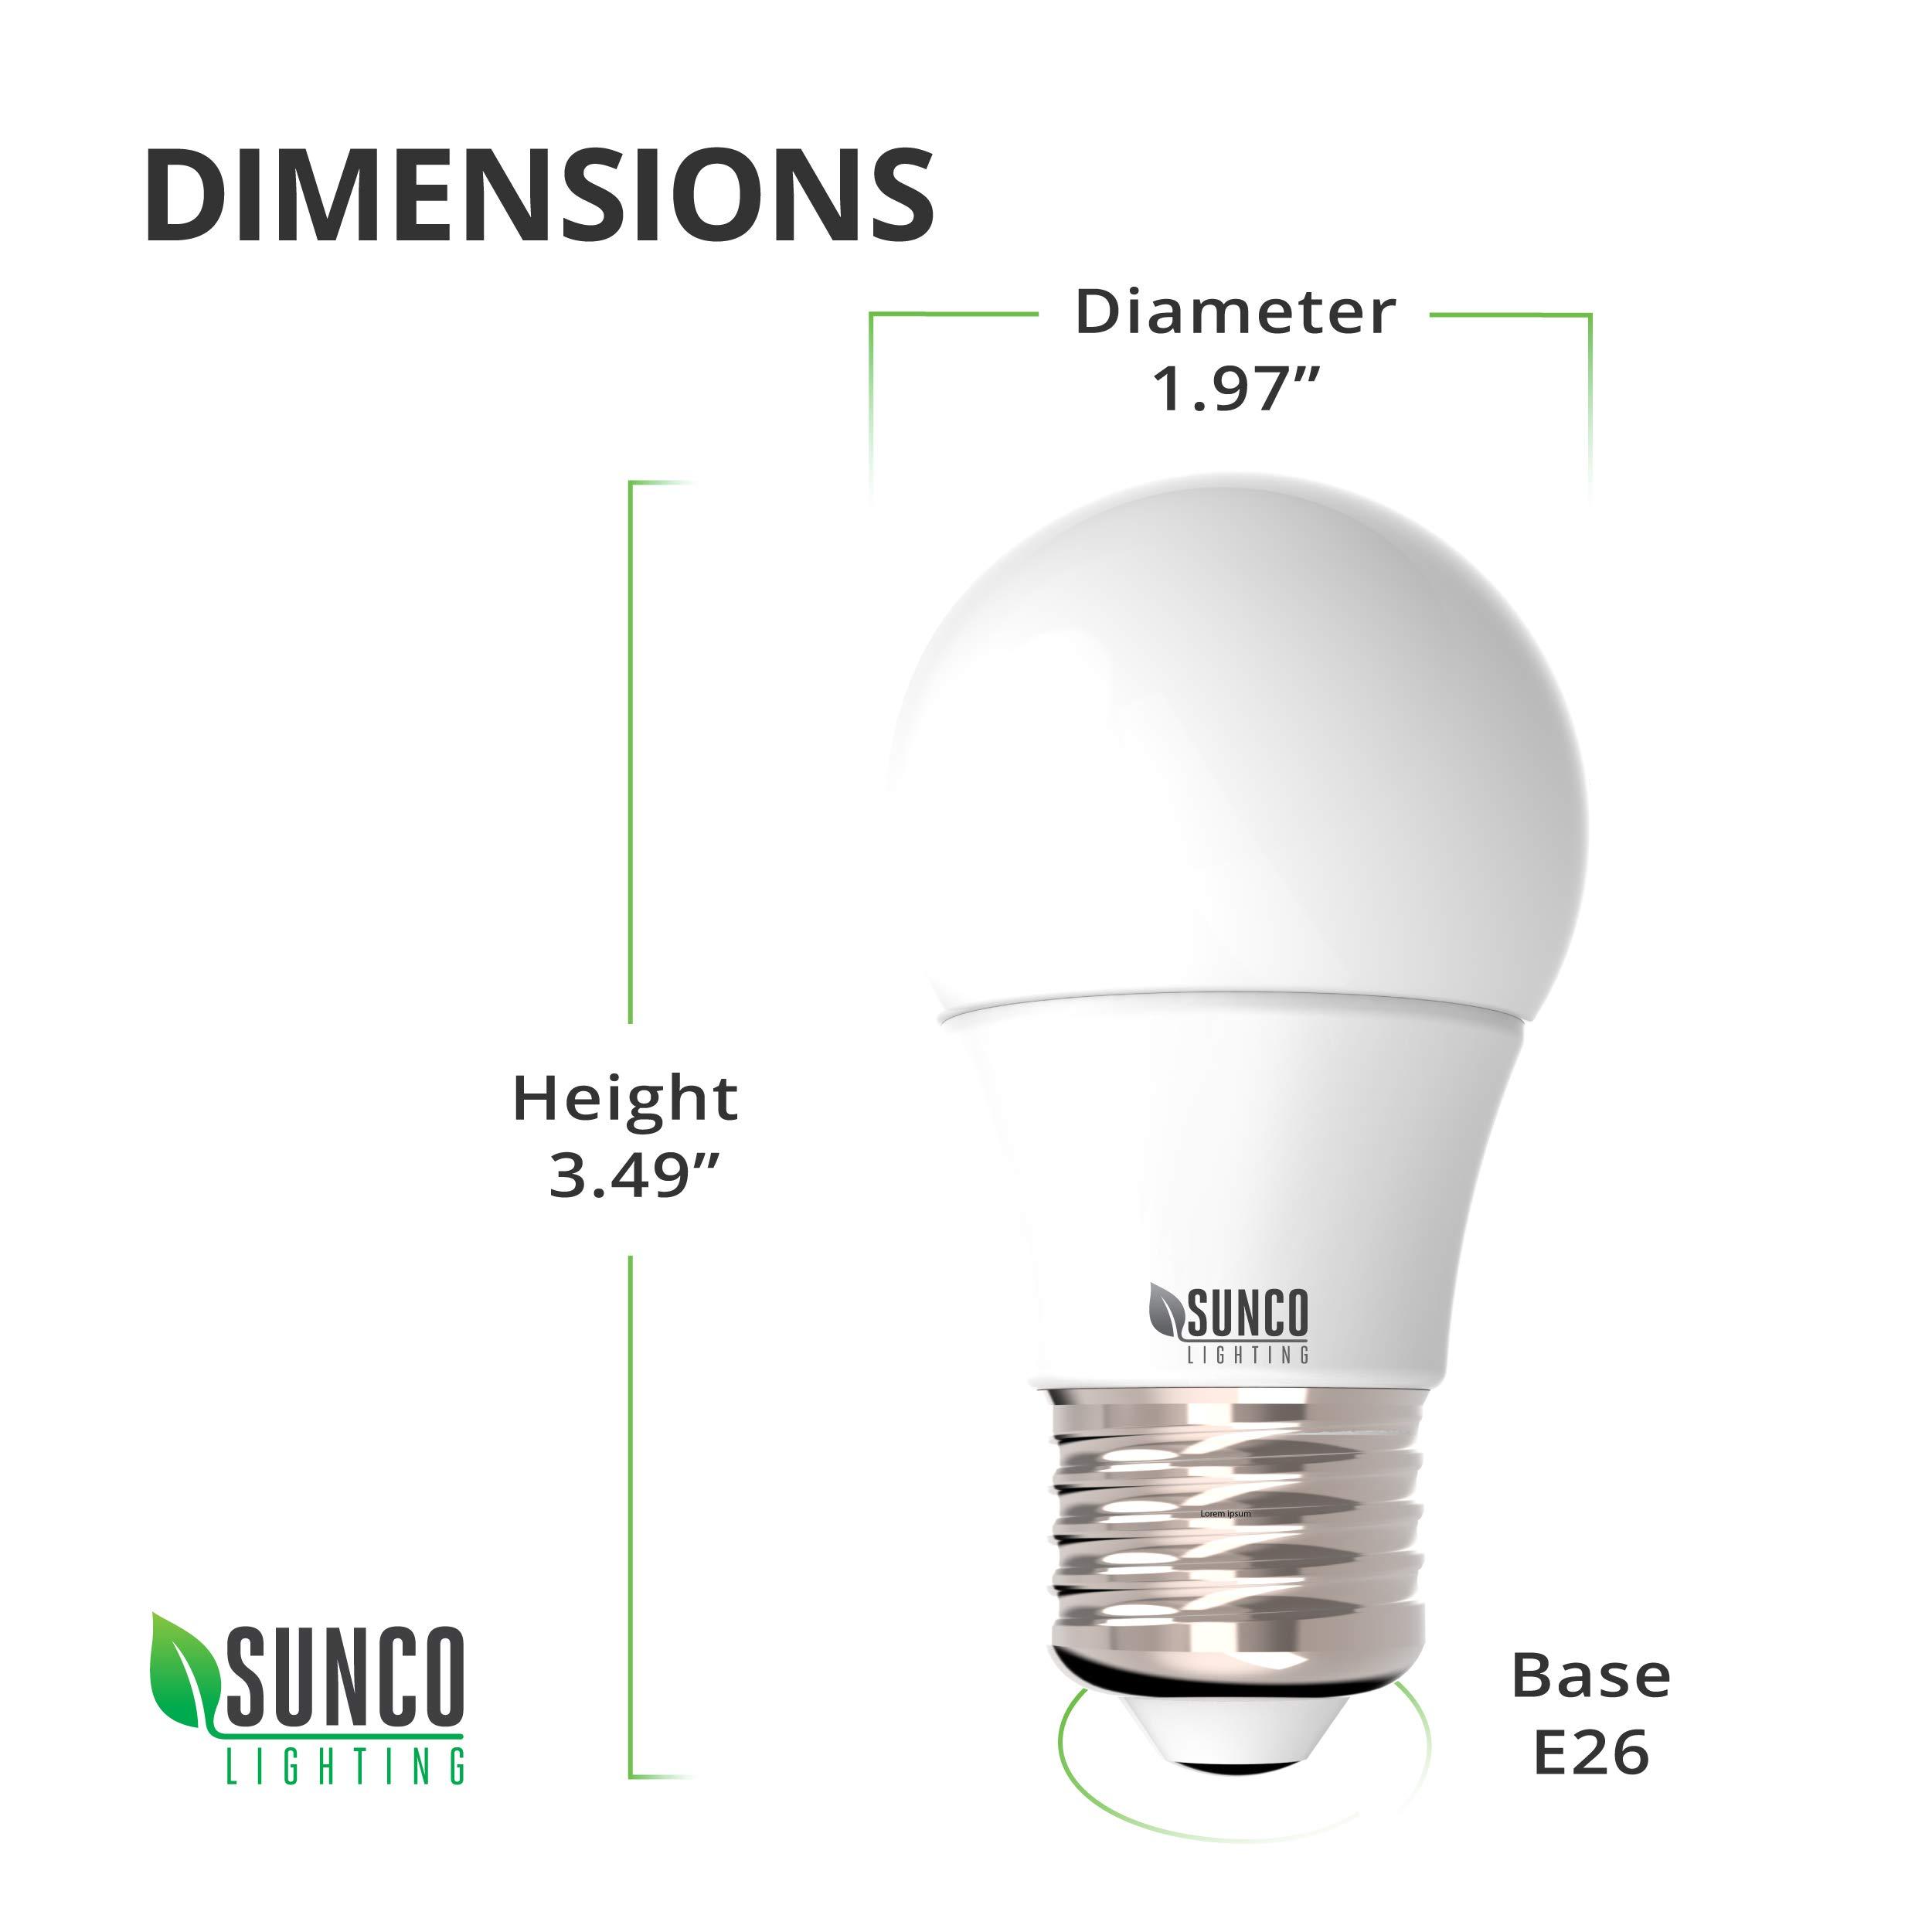 Sunco Lighting 10 Pack A15 LED Bulb, 8W=60W, 3000K Warm White, Dimmable, 800 LM, E26 Base, Refrigerator & Fan Light - UL, Energy Star by Sunco Lighting (Image #4)